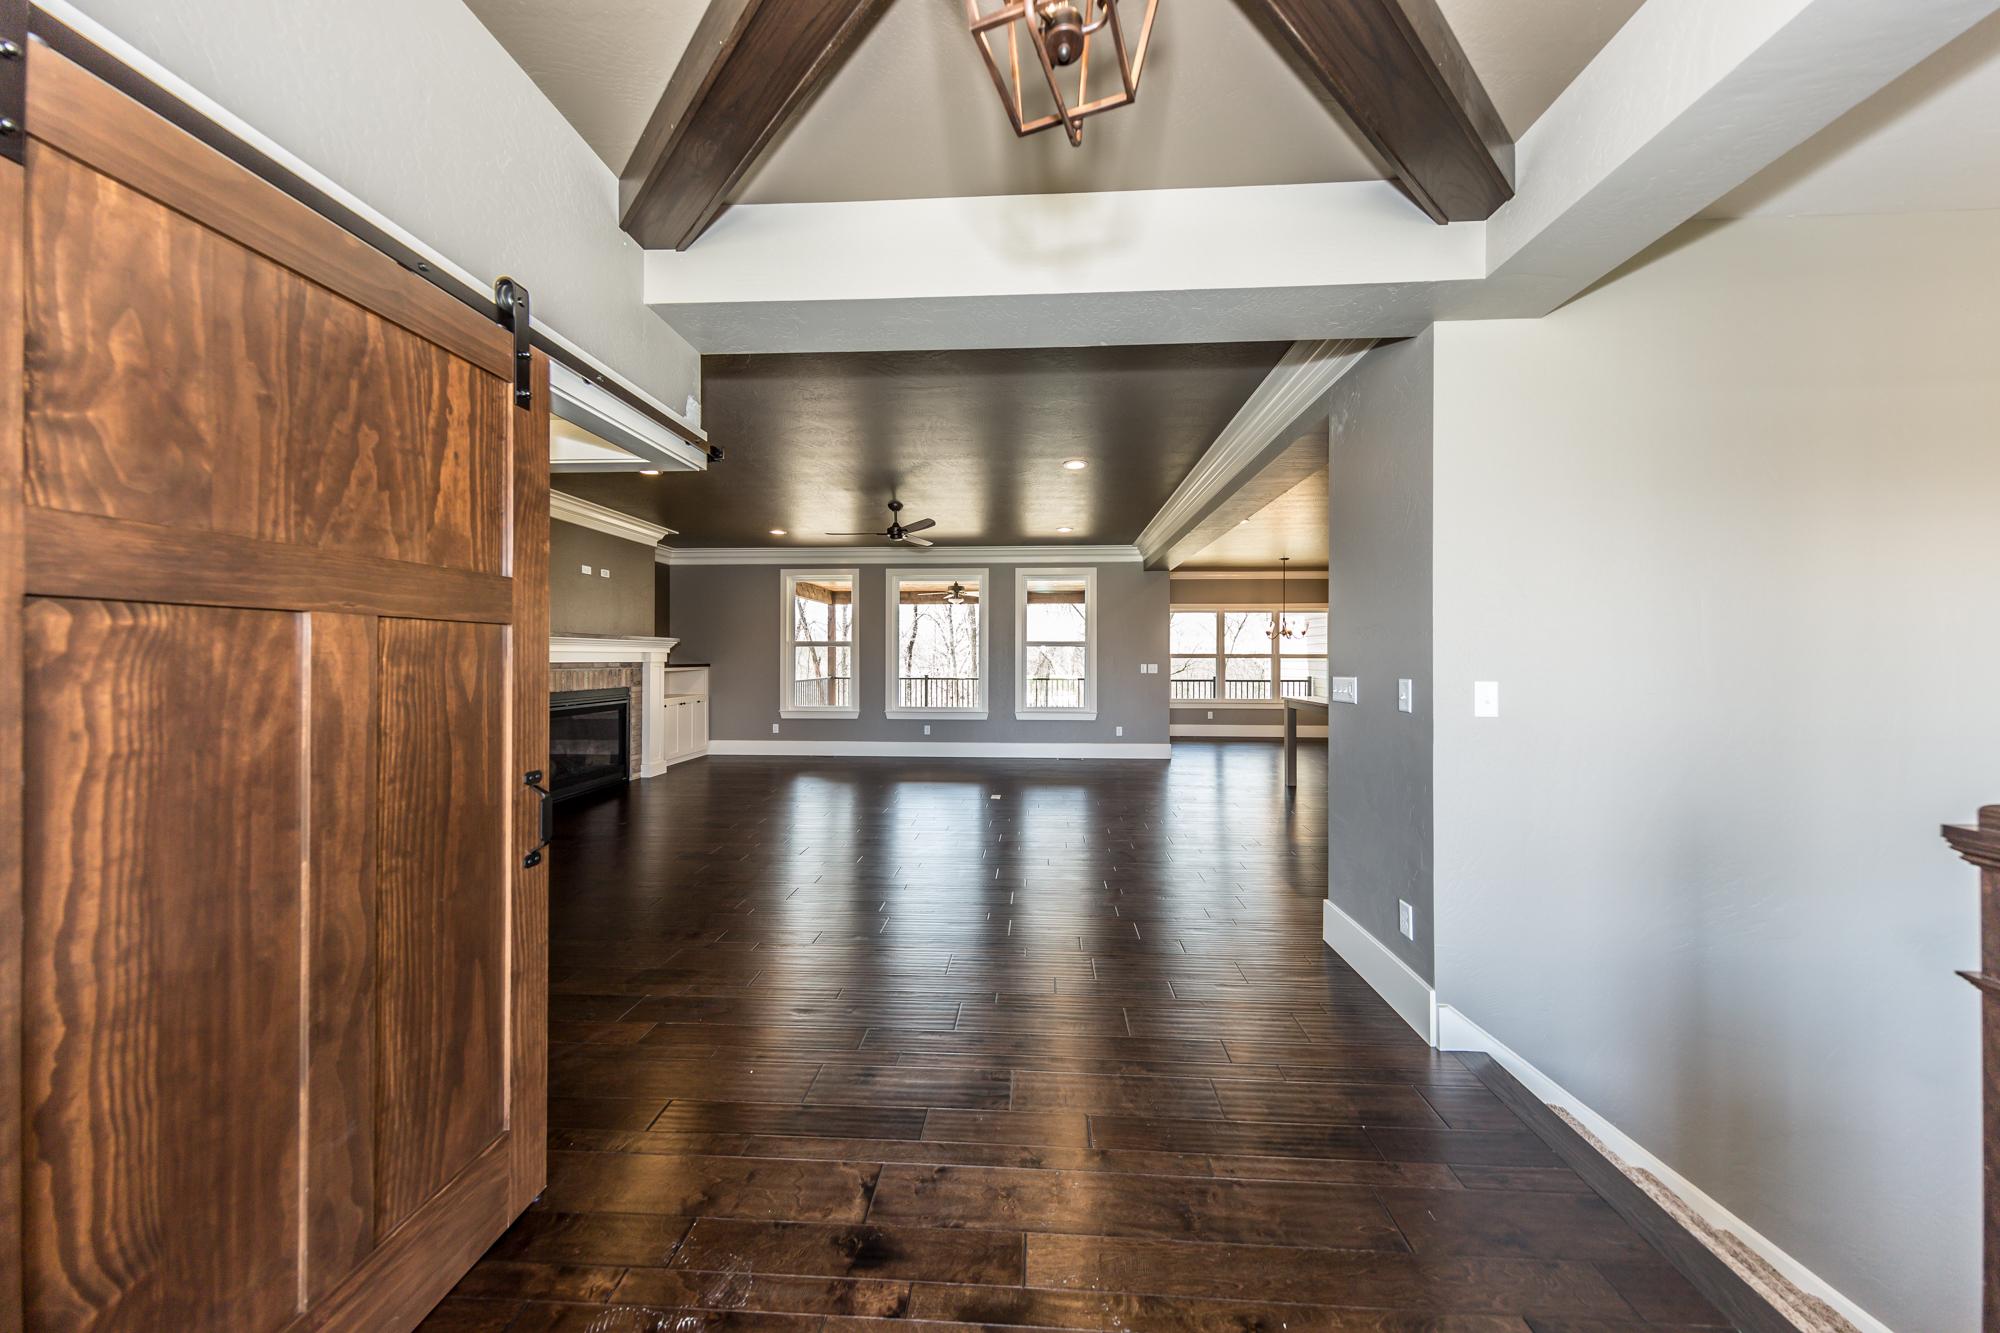 New-Construction-For-Sale-Bethel-Ridge-Farms-Scott-AFB-Illinois-1.jpg